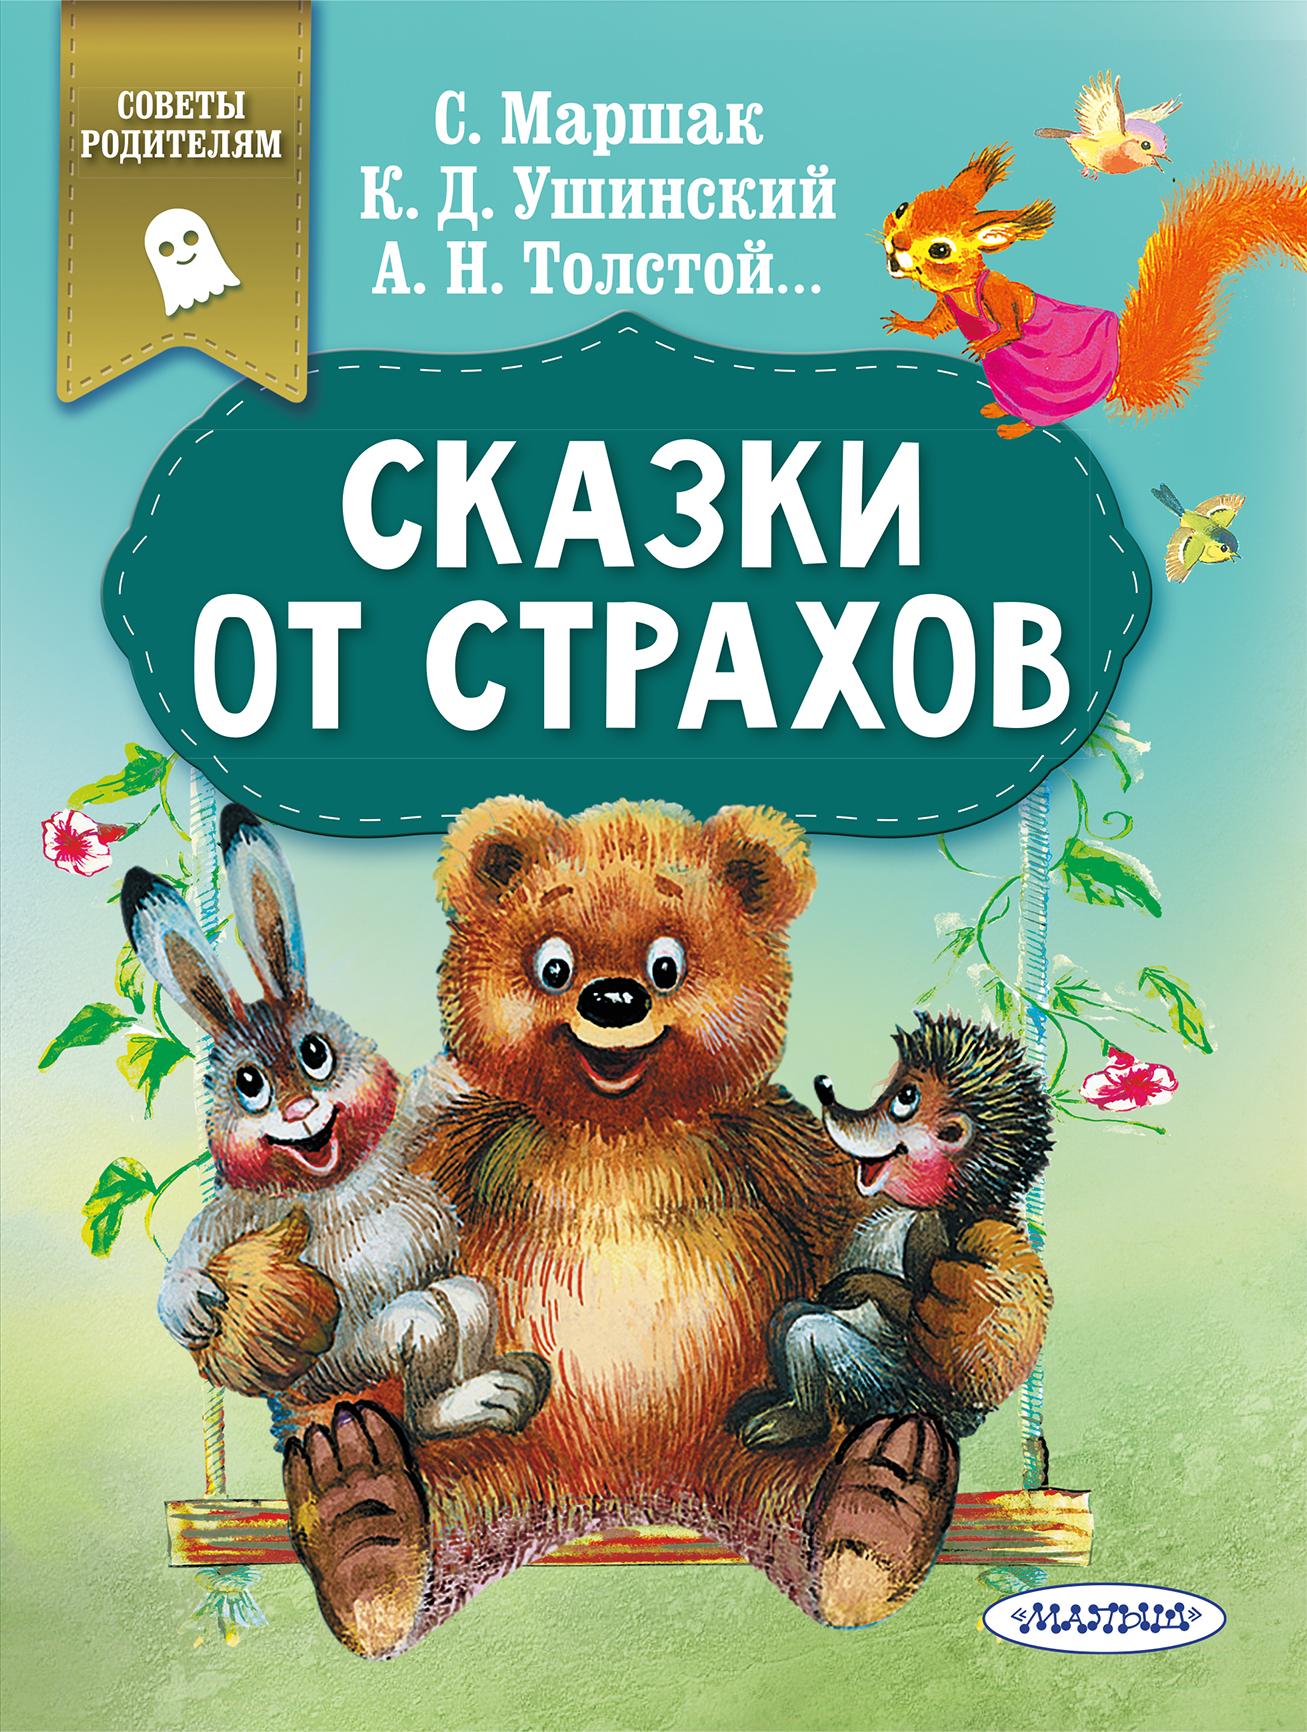 Ушинский К.Д., Толстой А.Н., Маршак С.Я. Сказки от страхов